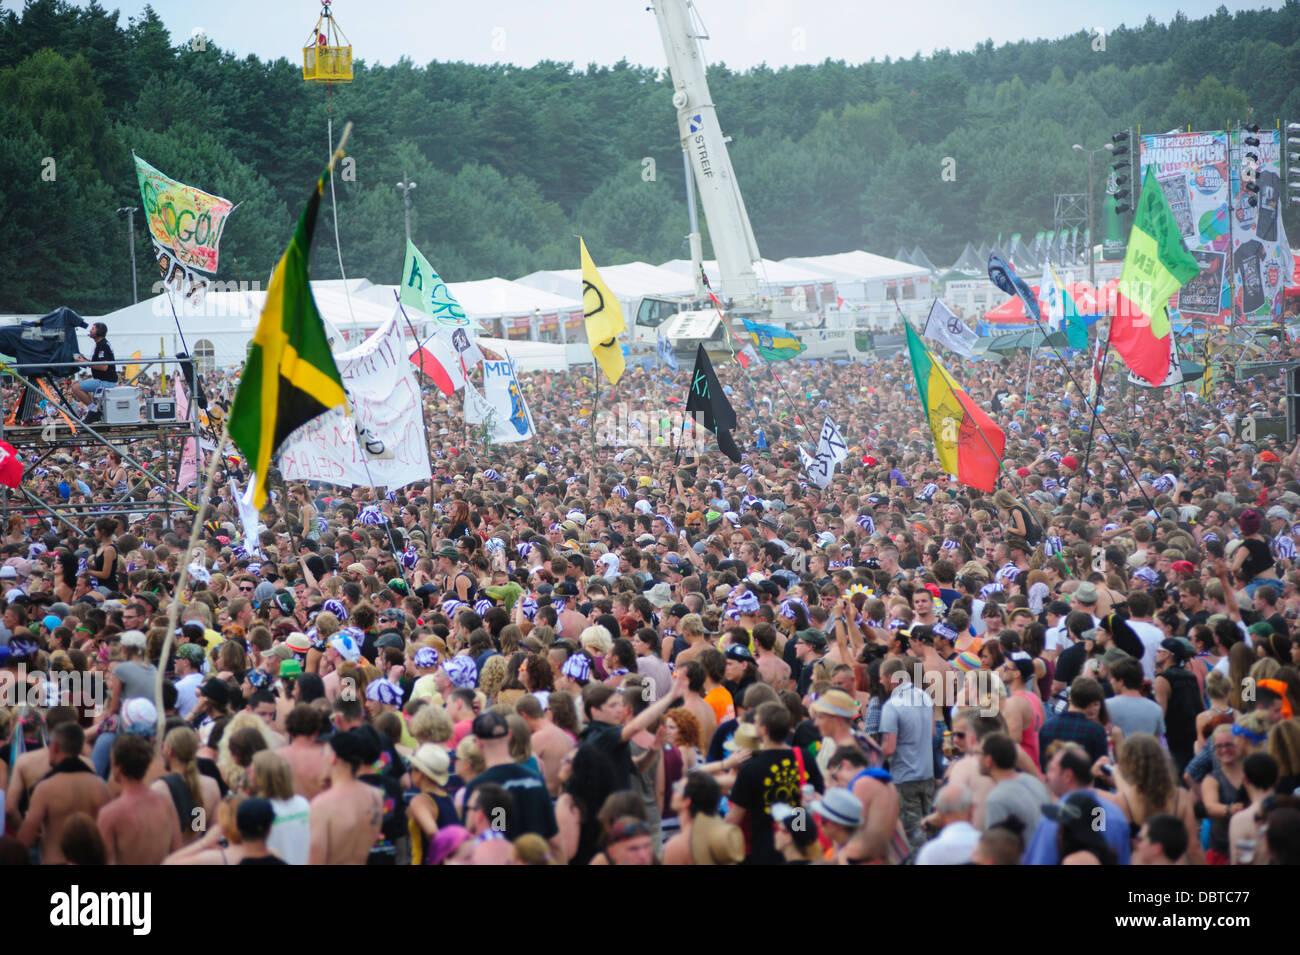 Vista general de las multitudes asistiendo en el Przystanek Woodstock music festival, Kostrzyn, Polonia. Imagen De Stock